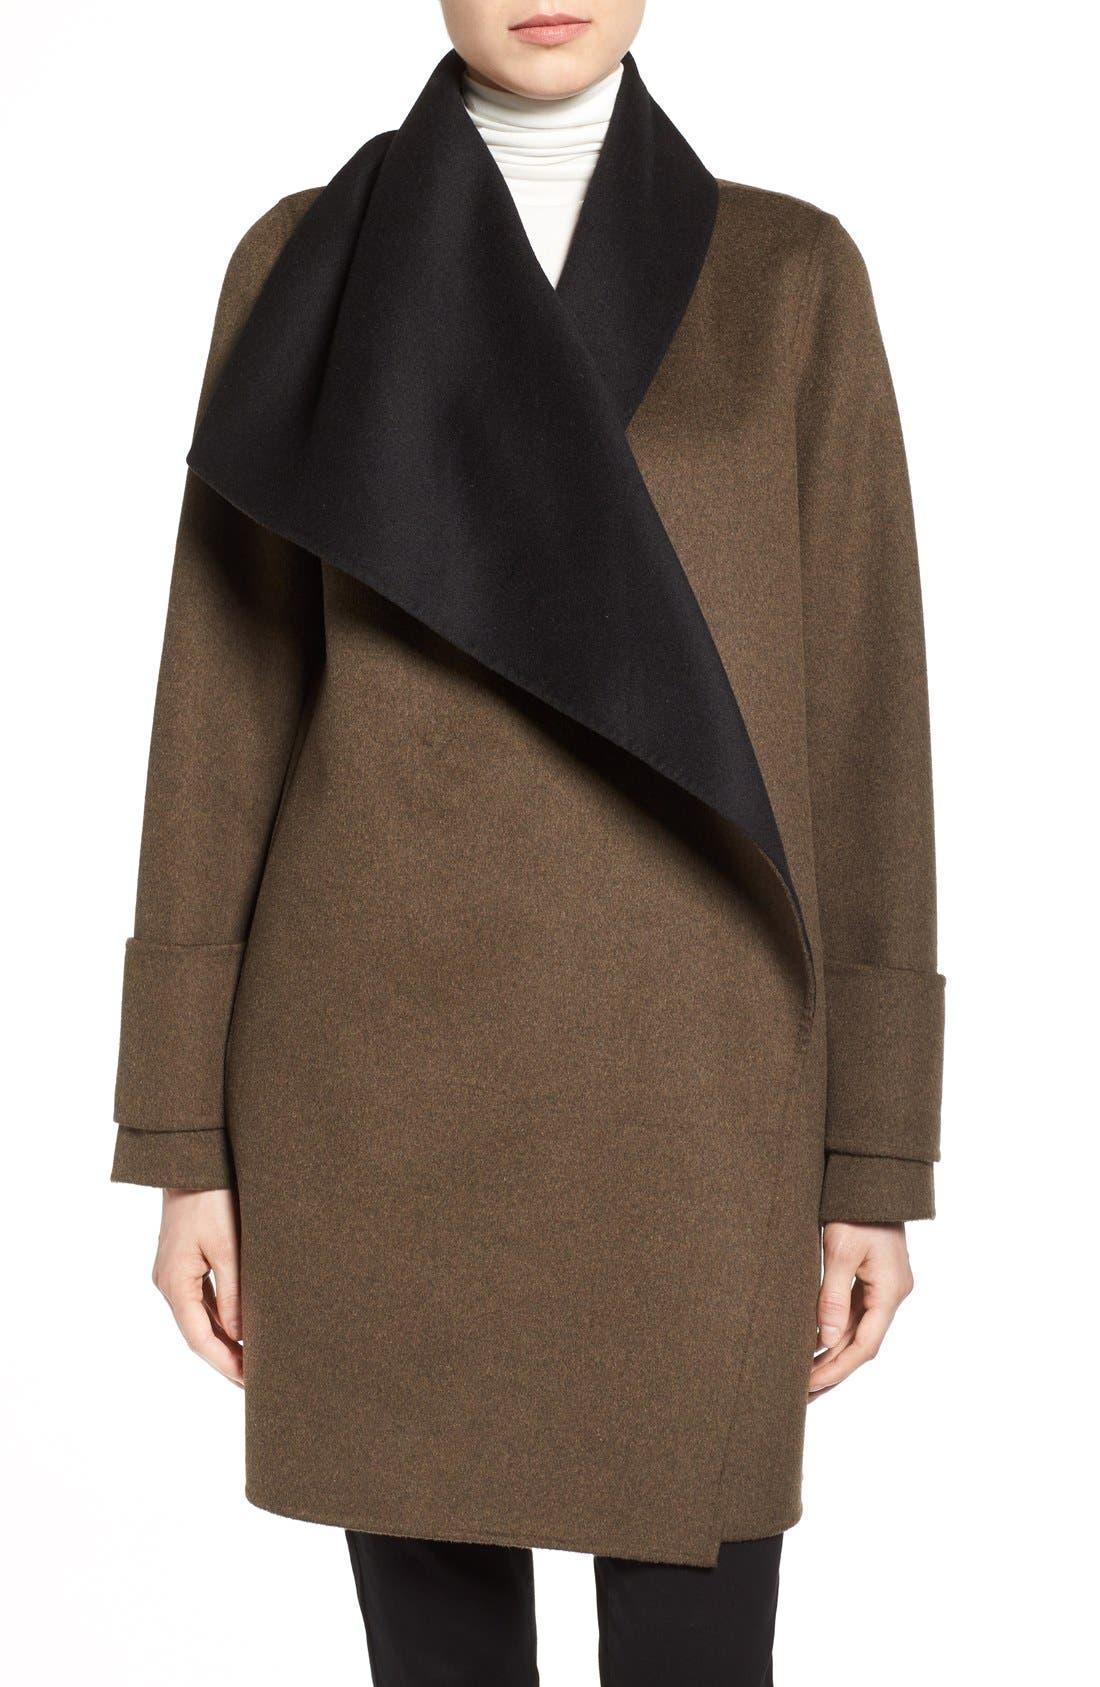 Alternate Image 1 Selected - Calvin Klein Double Face Drape Front Coat